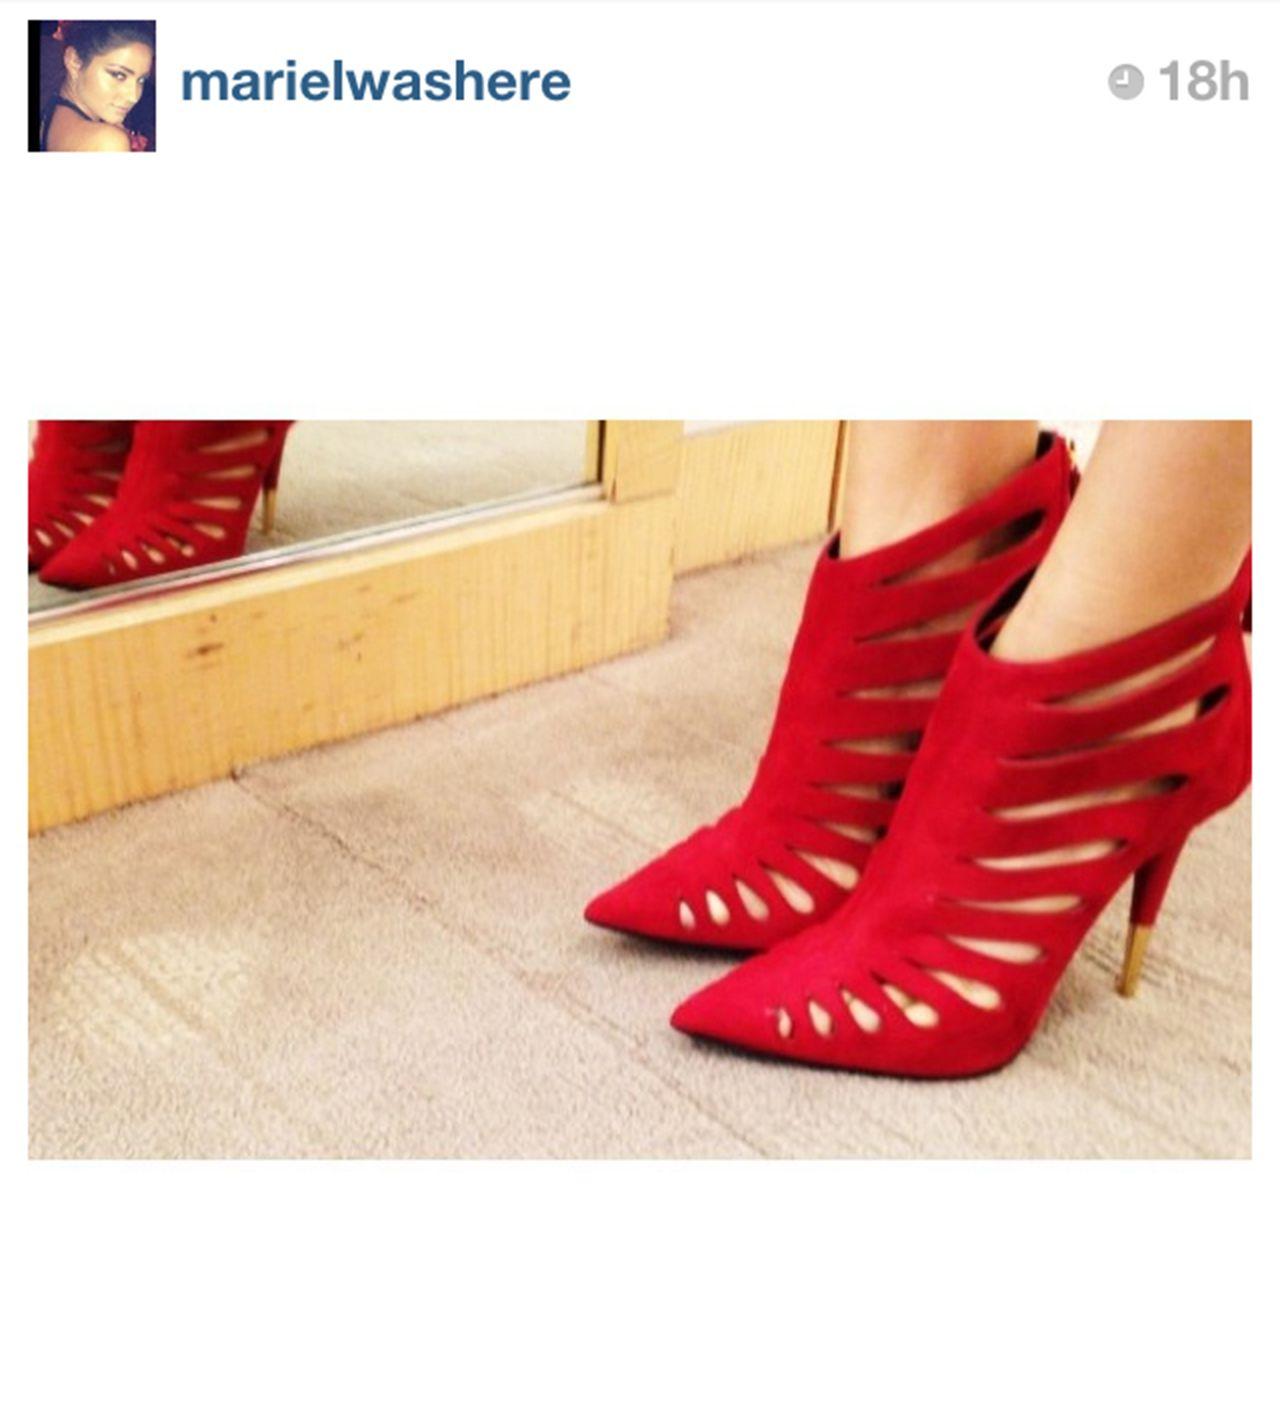 Celebrity Stylist Mariel Haenn in Giuseppe Zanotti: 20 Best Celebrity Shoe Instagrams - Lookbooks, Photos   ModaMob